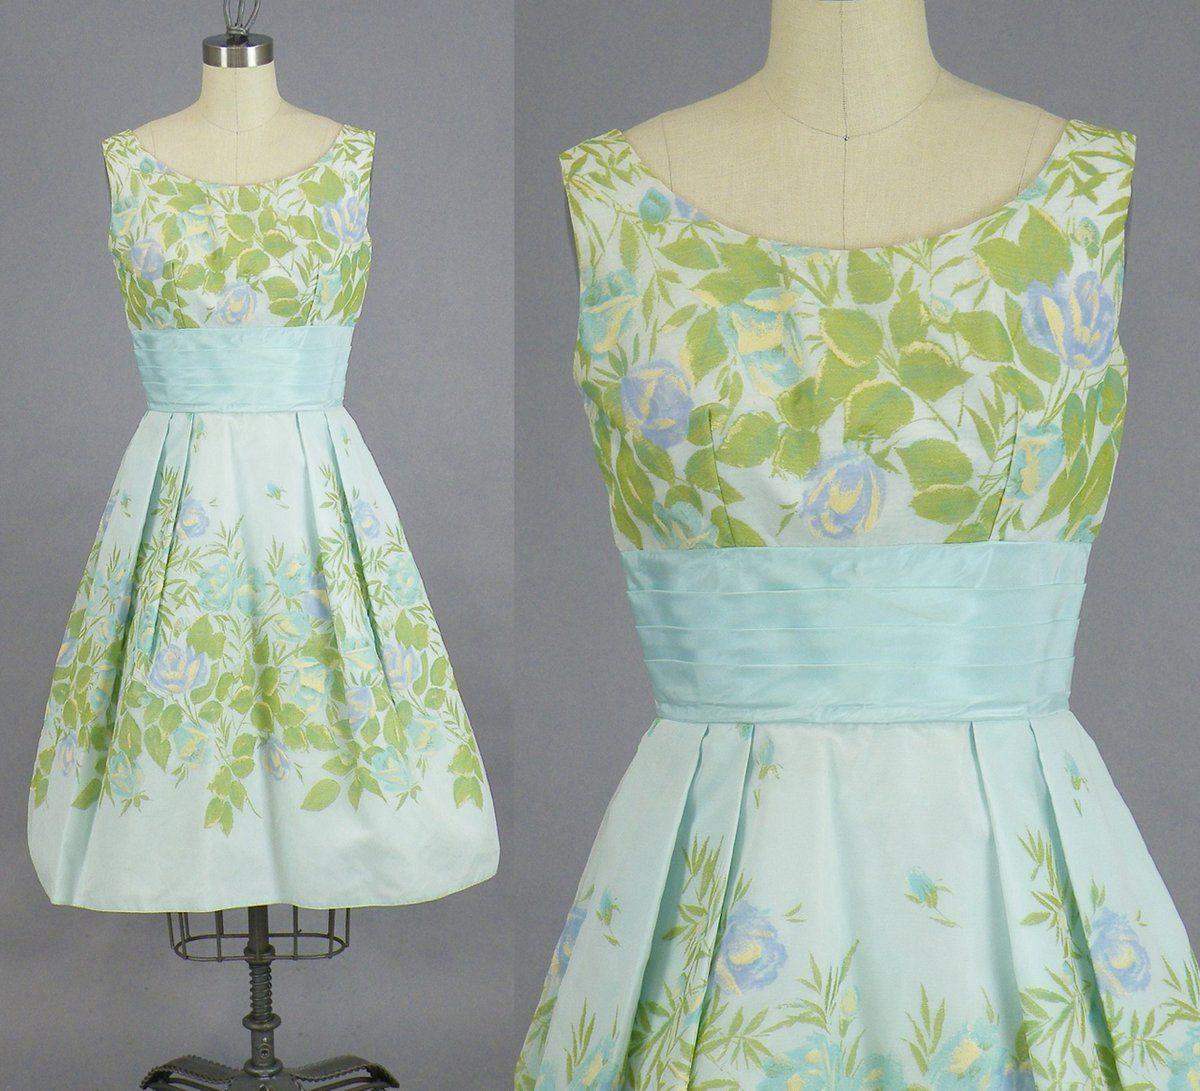 1960s Prom Dress, 60s Roses Dress, Vintage 60s Floral Party Dress ...